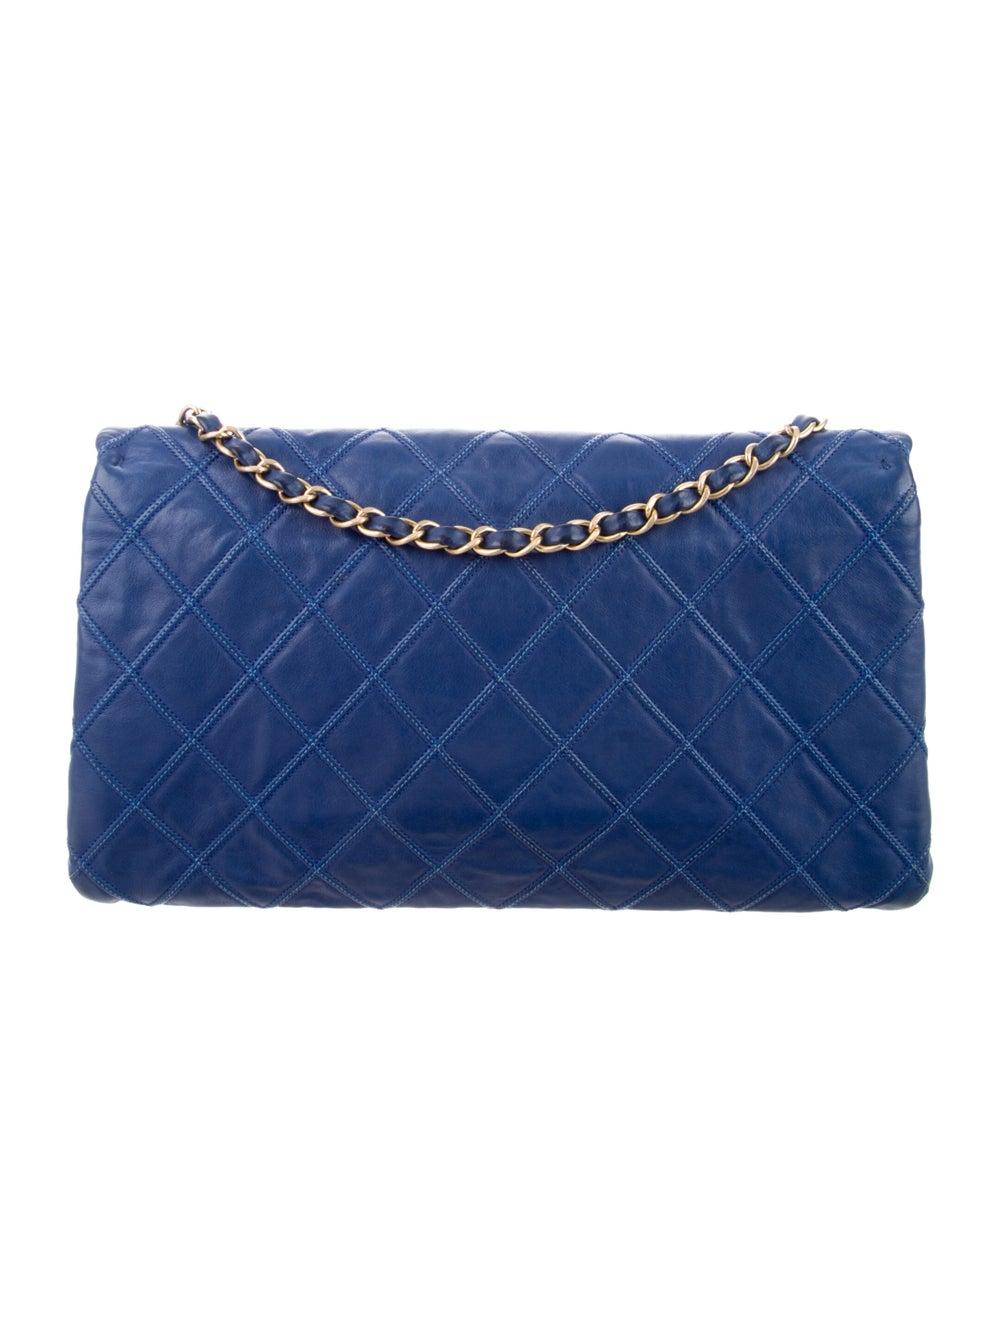 Chanel Thin City Flap Bag Blue - image 4